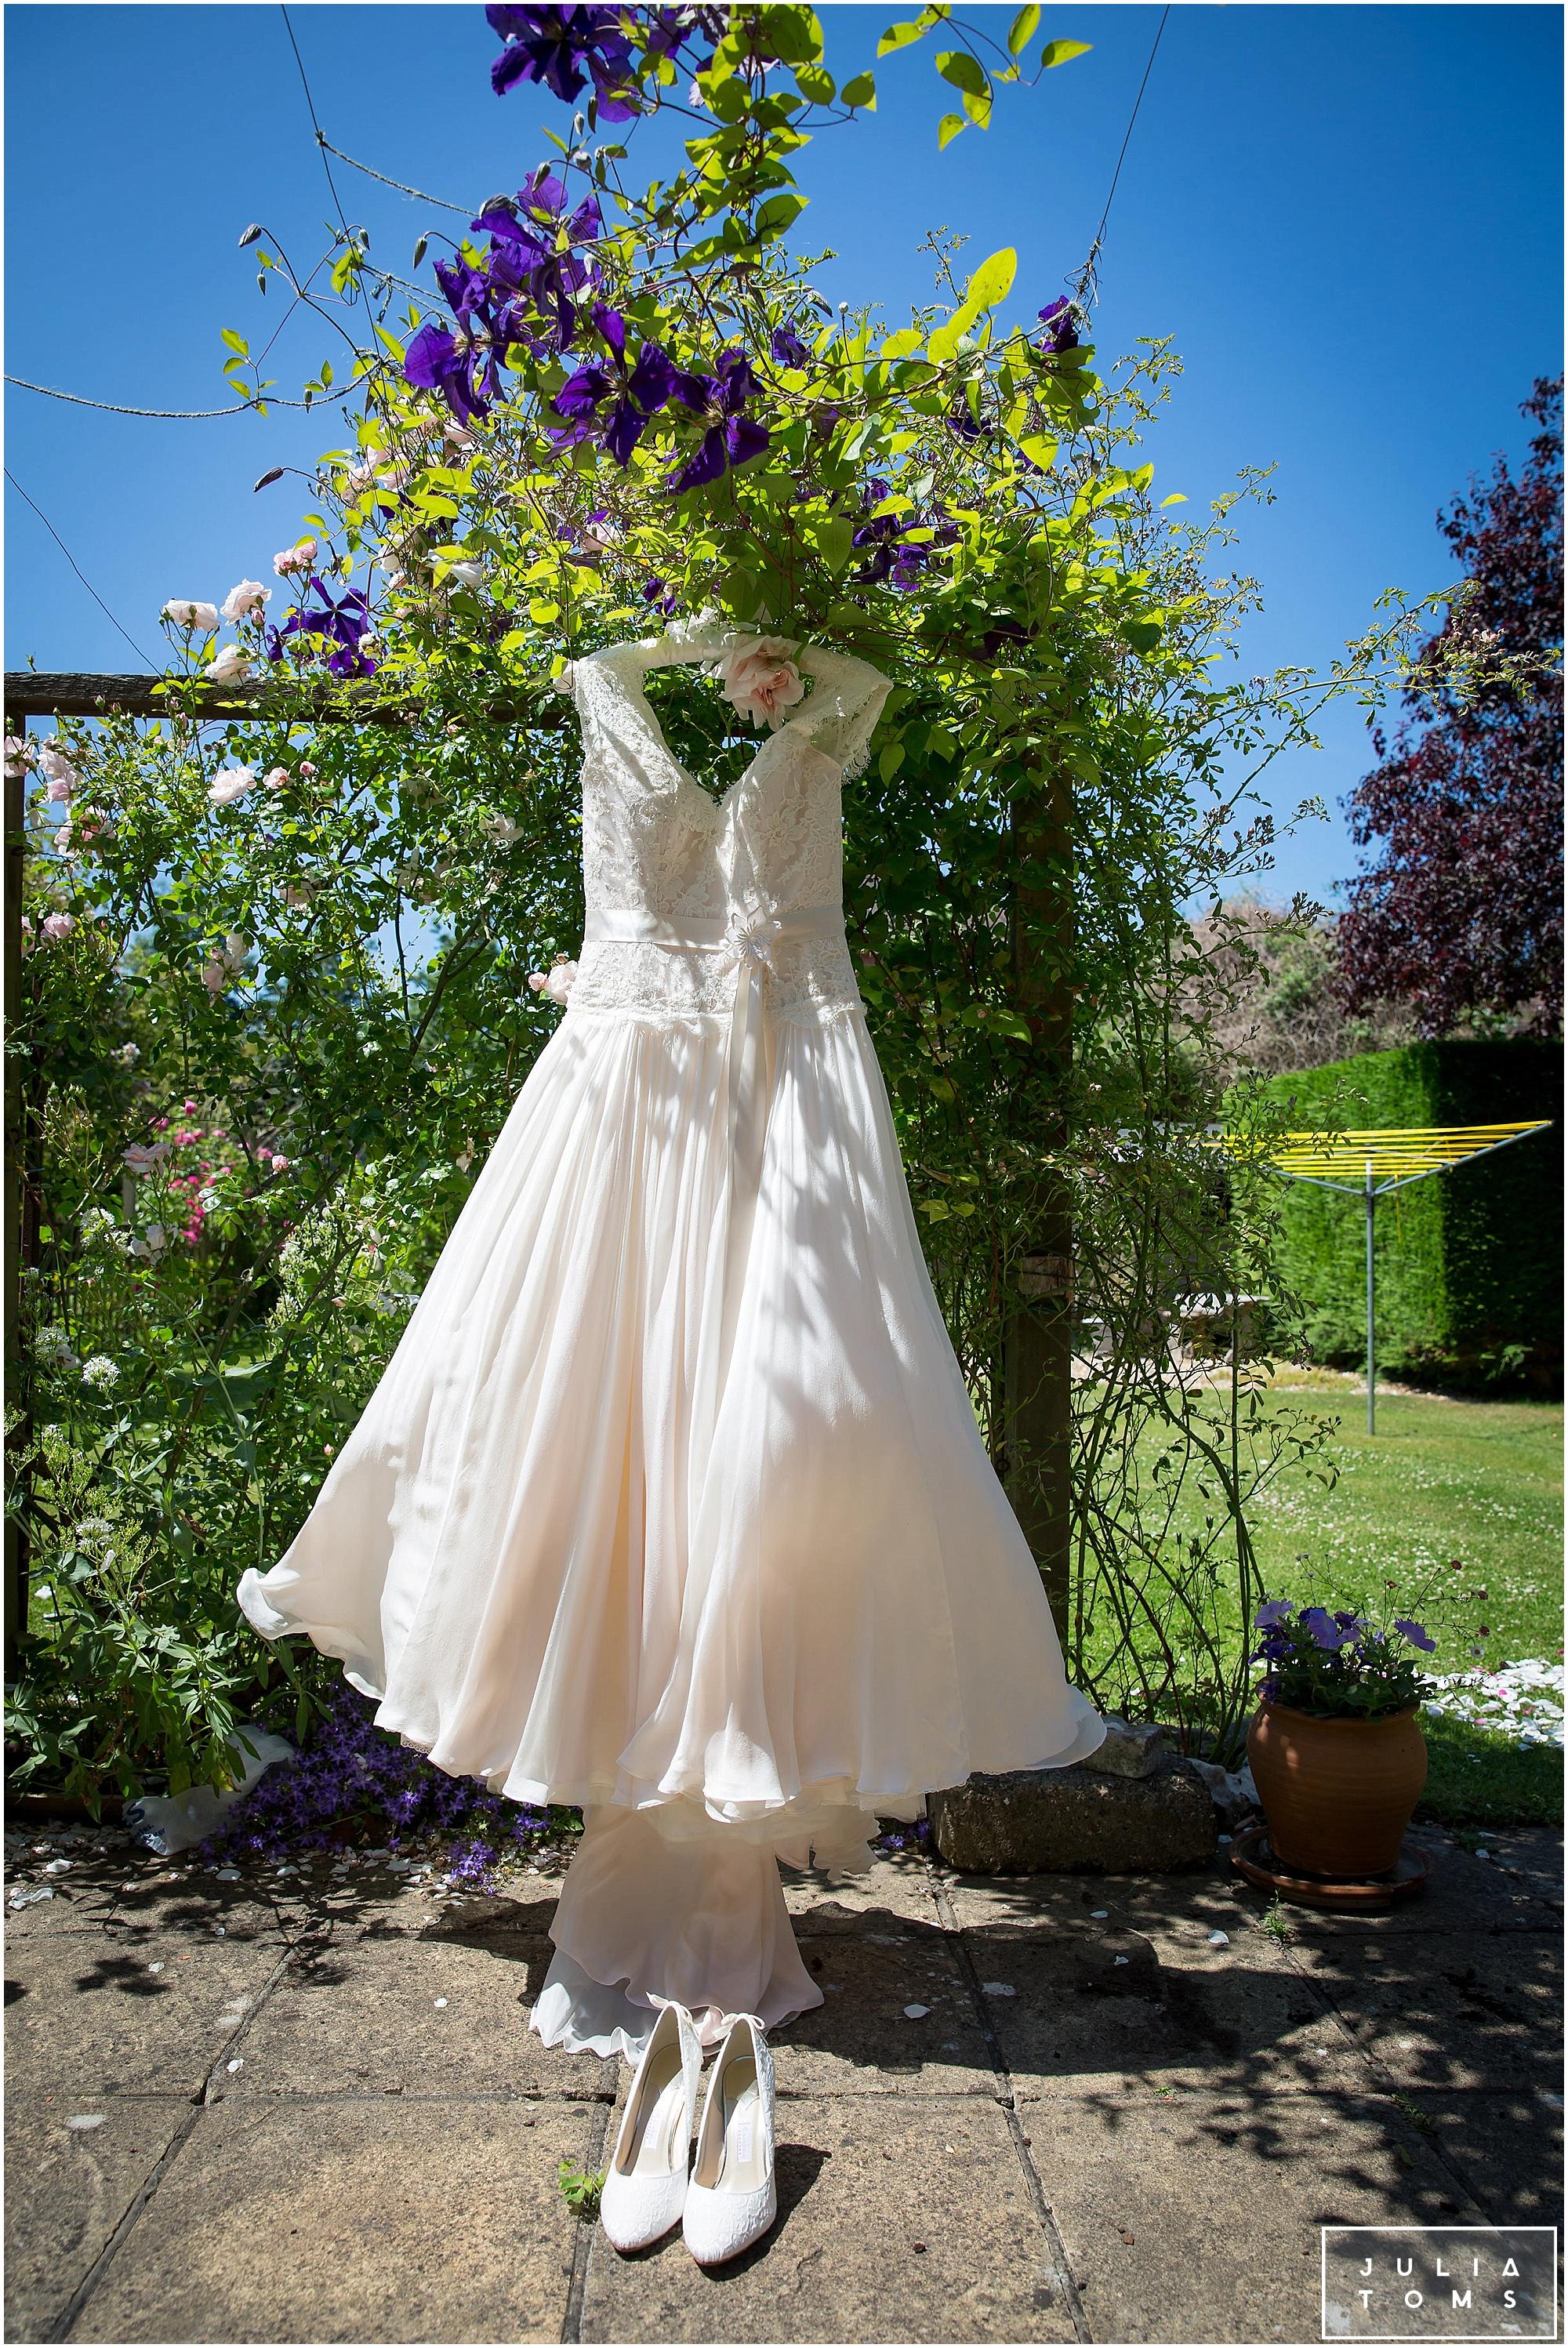 julia_toms_chichester_wedding_photographer_portsmouth_001.jpg